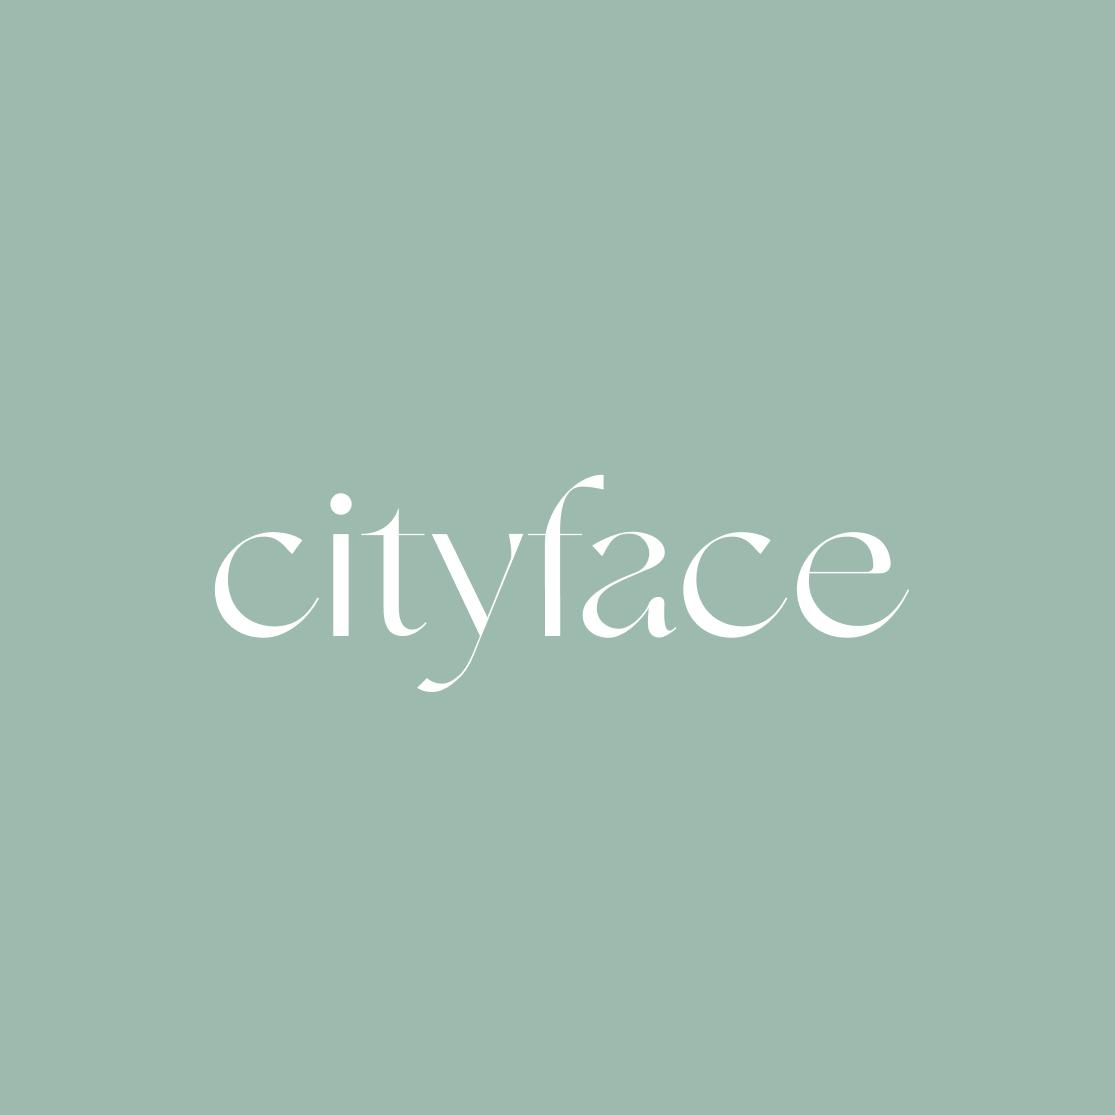 Cityface